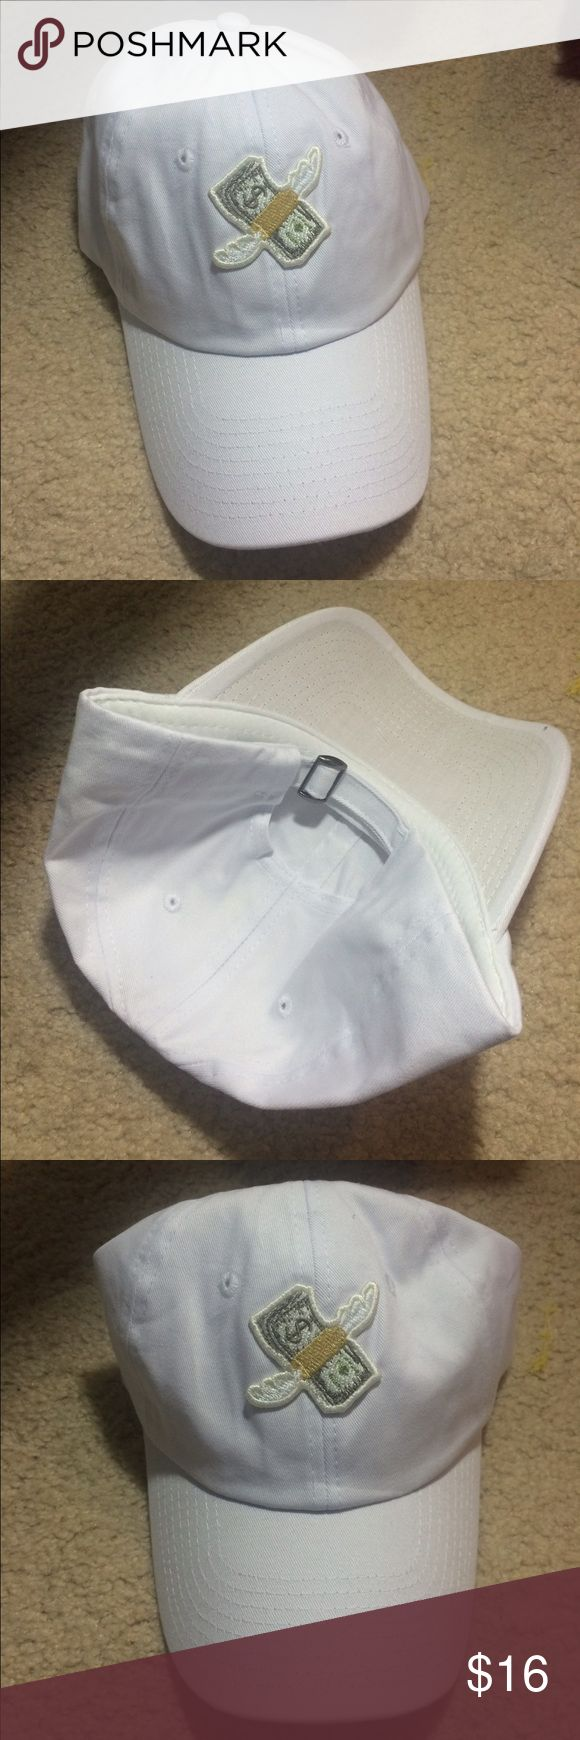 White baseball cap with money emoji Adjustable back, white baseball cap with the money with wings emoji. I HAVE 5 LEFT Accessories Hats